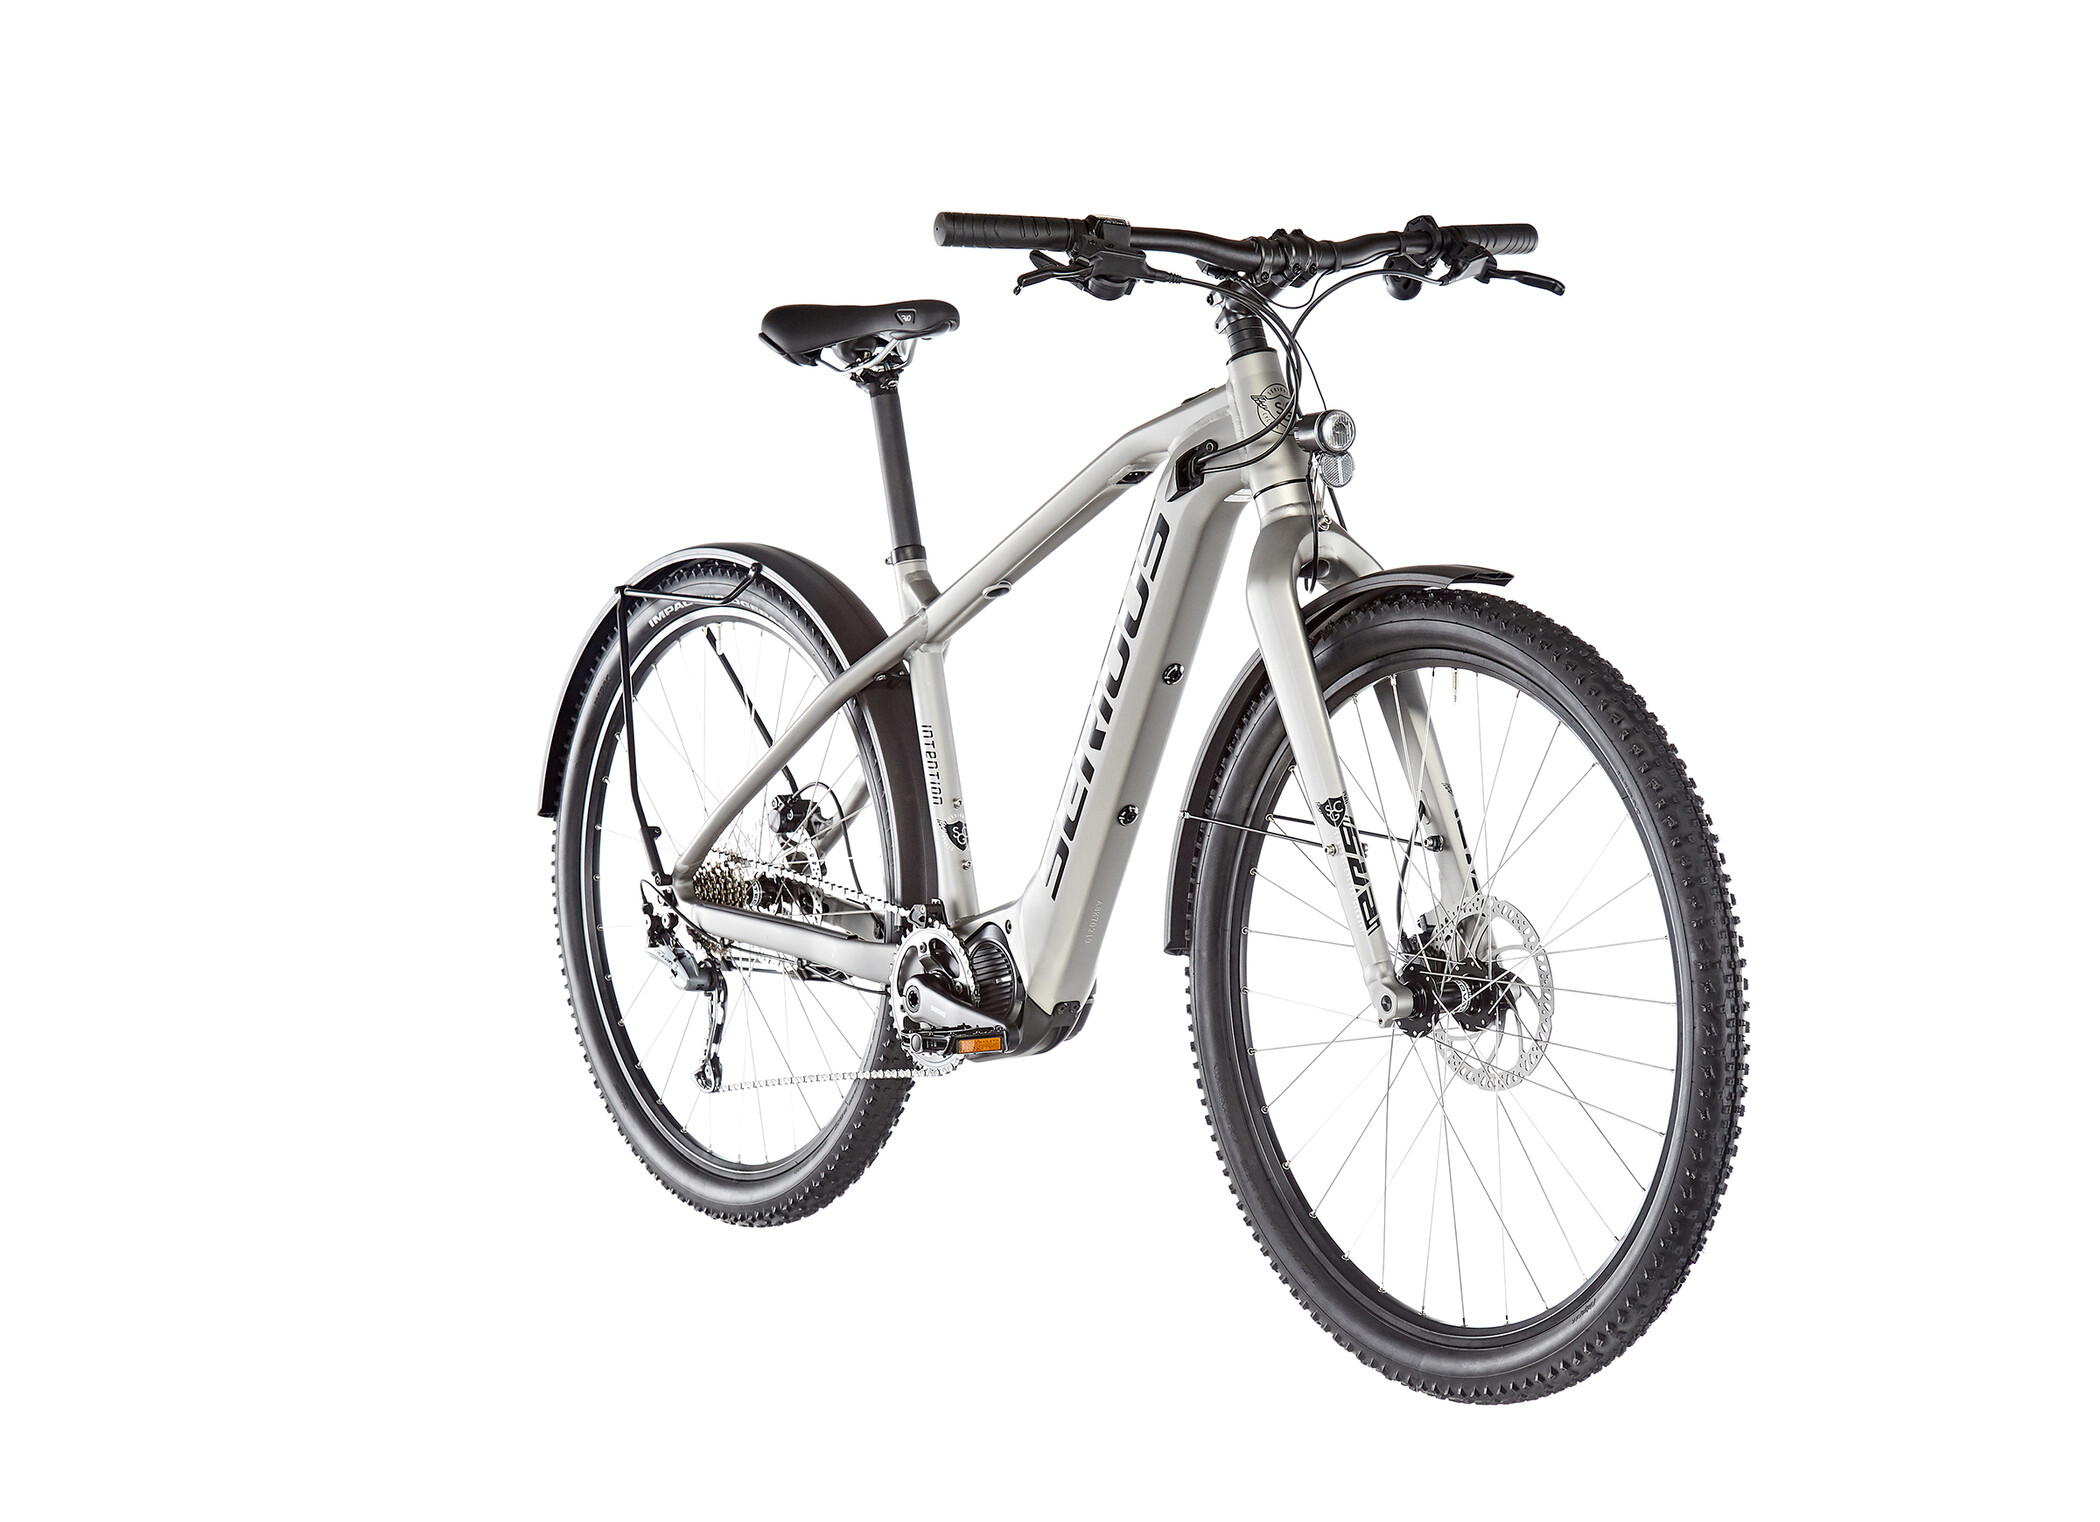 Stern Fahrrad in Fahrräder günstig kaufen | eBay